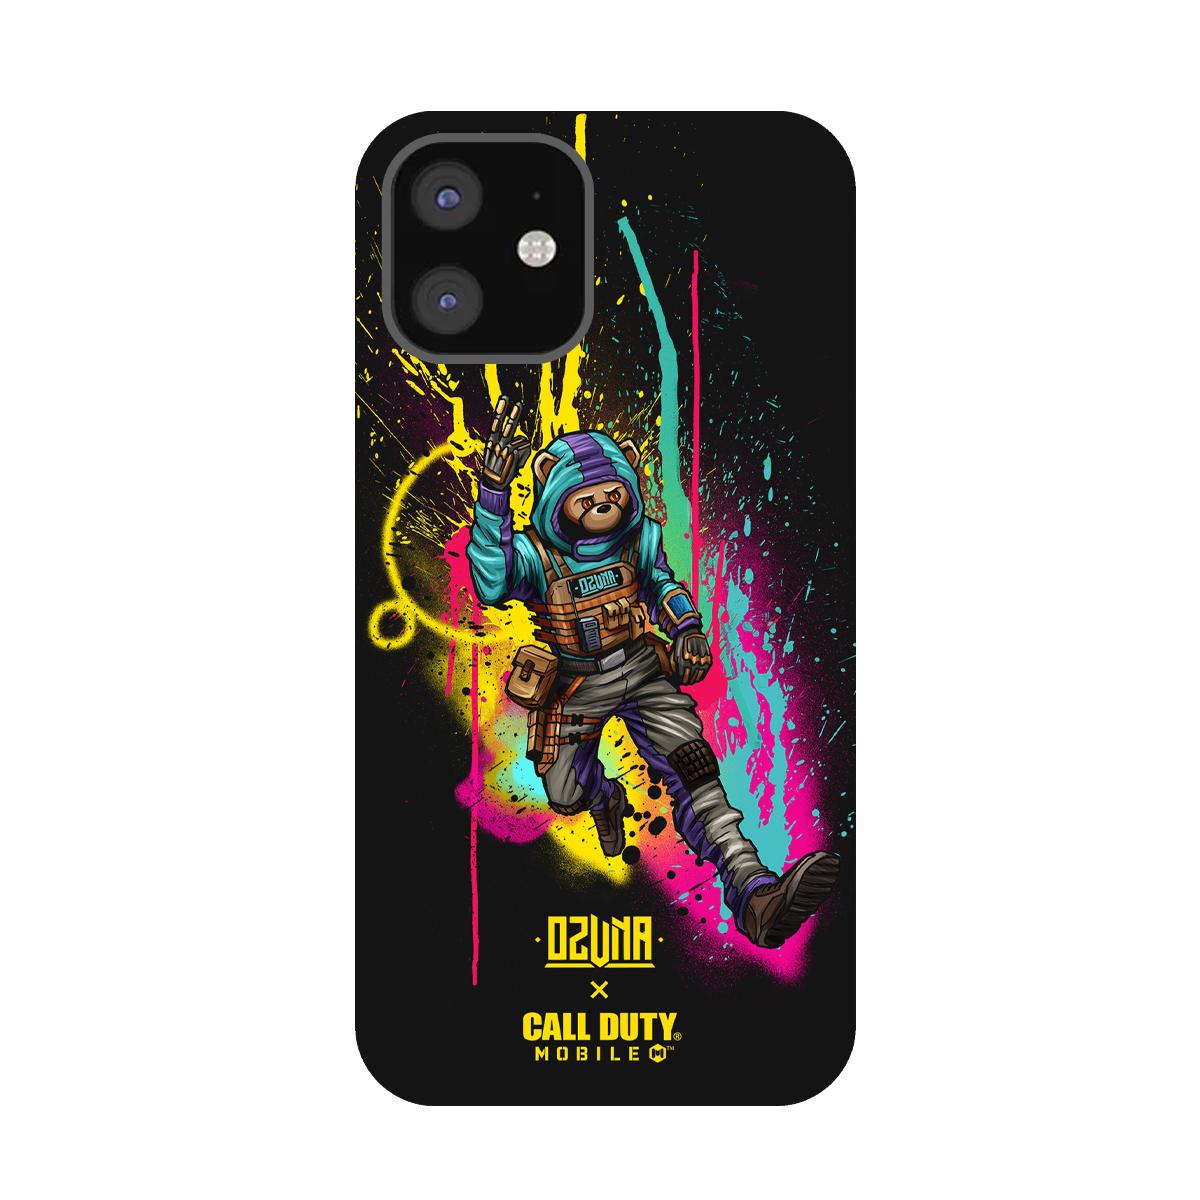 Ozuna x Call of Duty Black Flex Phone Case